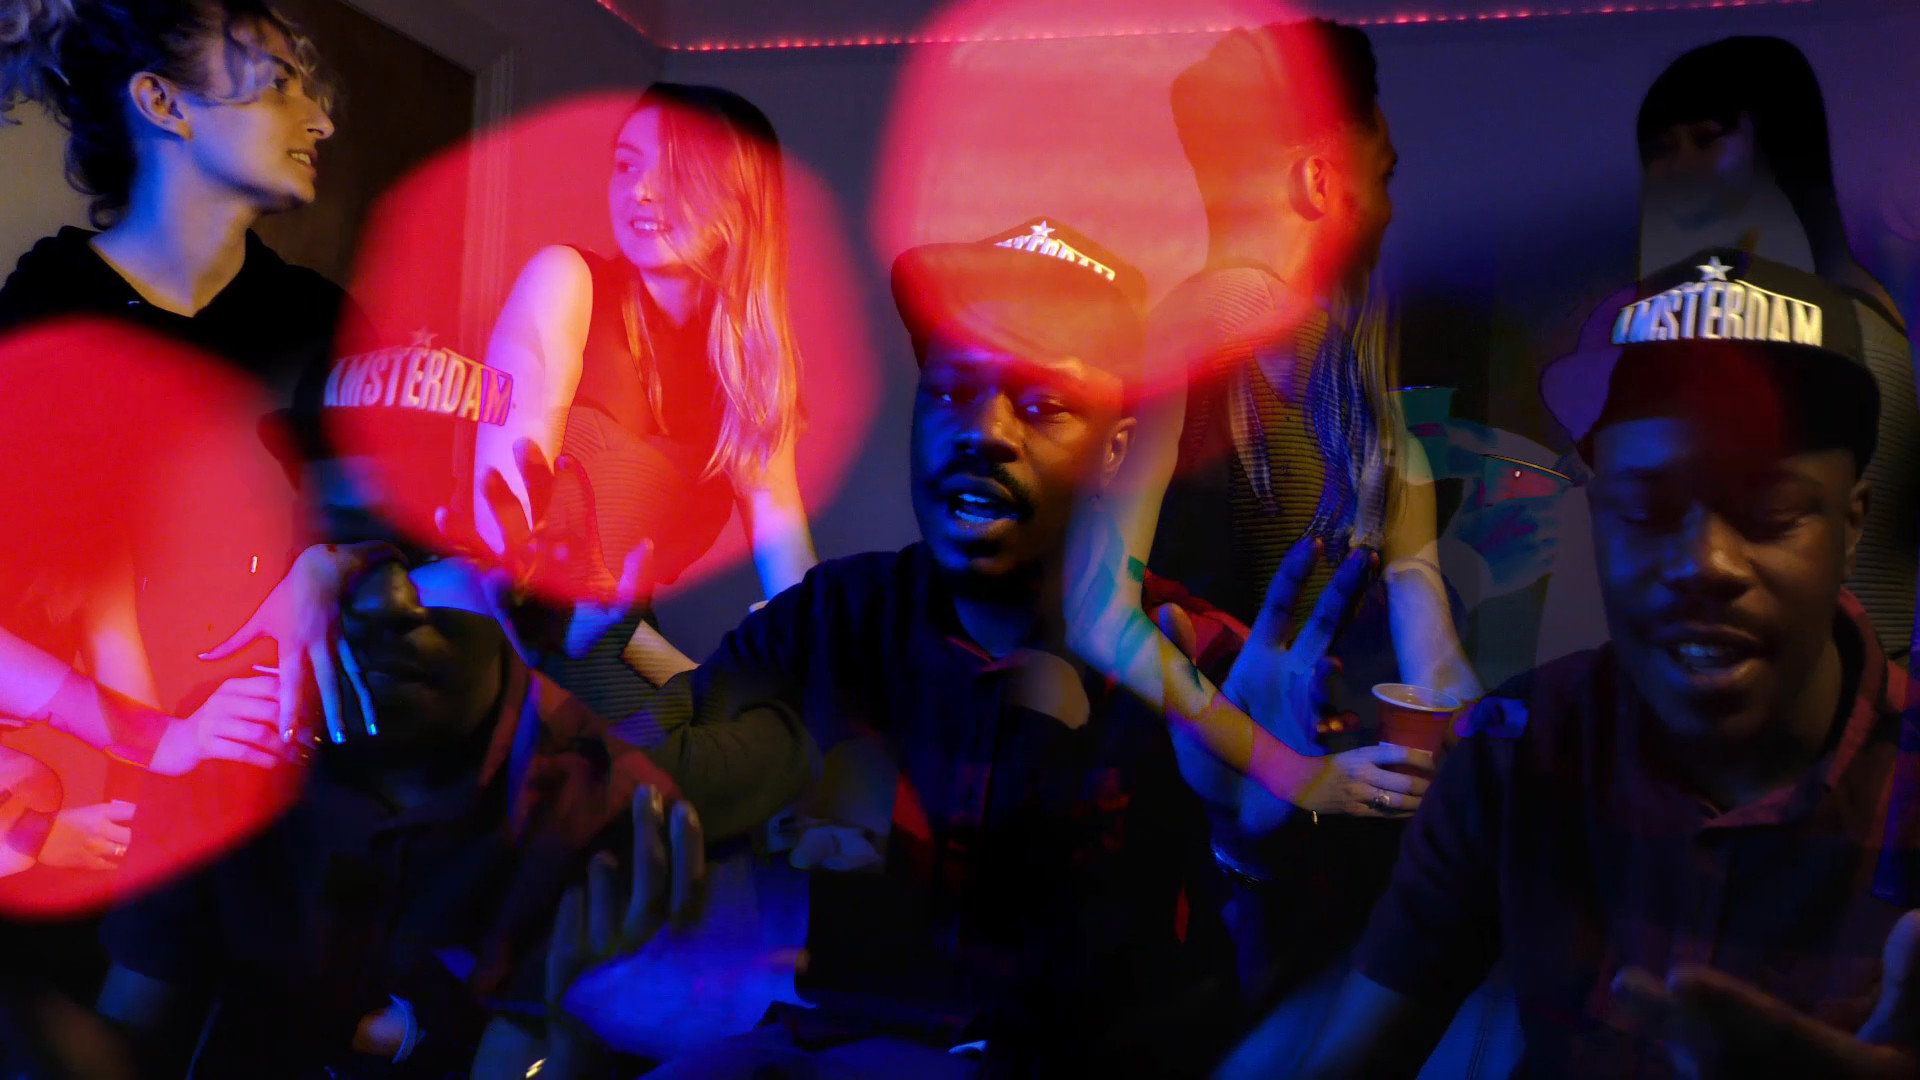 Still from Movement Films narrative music video Jepeto Knockz: Life Now